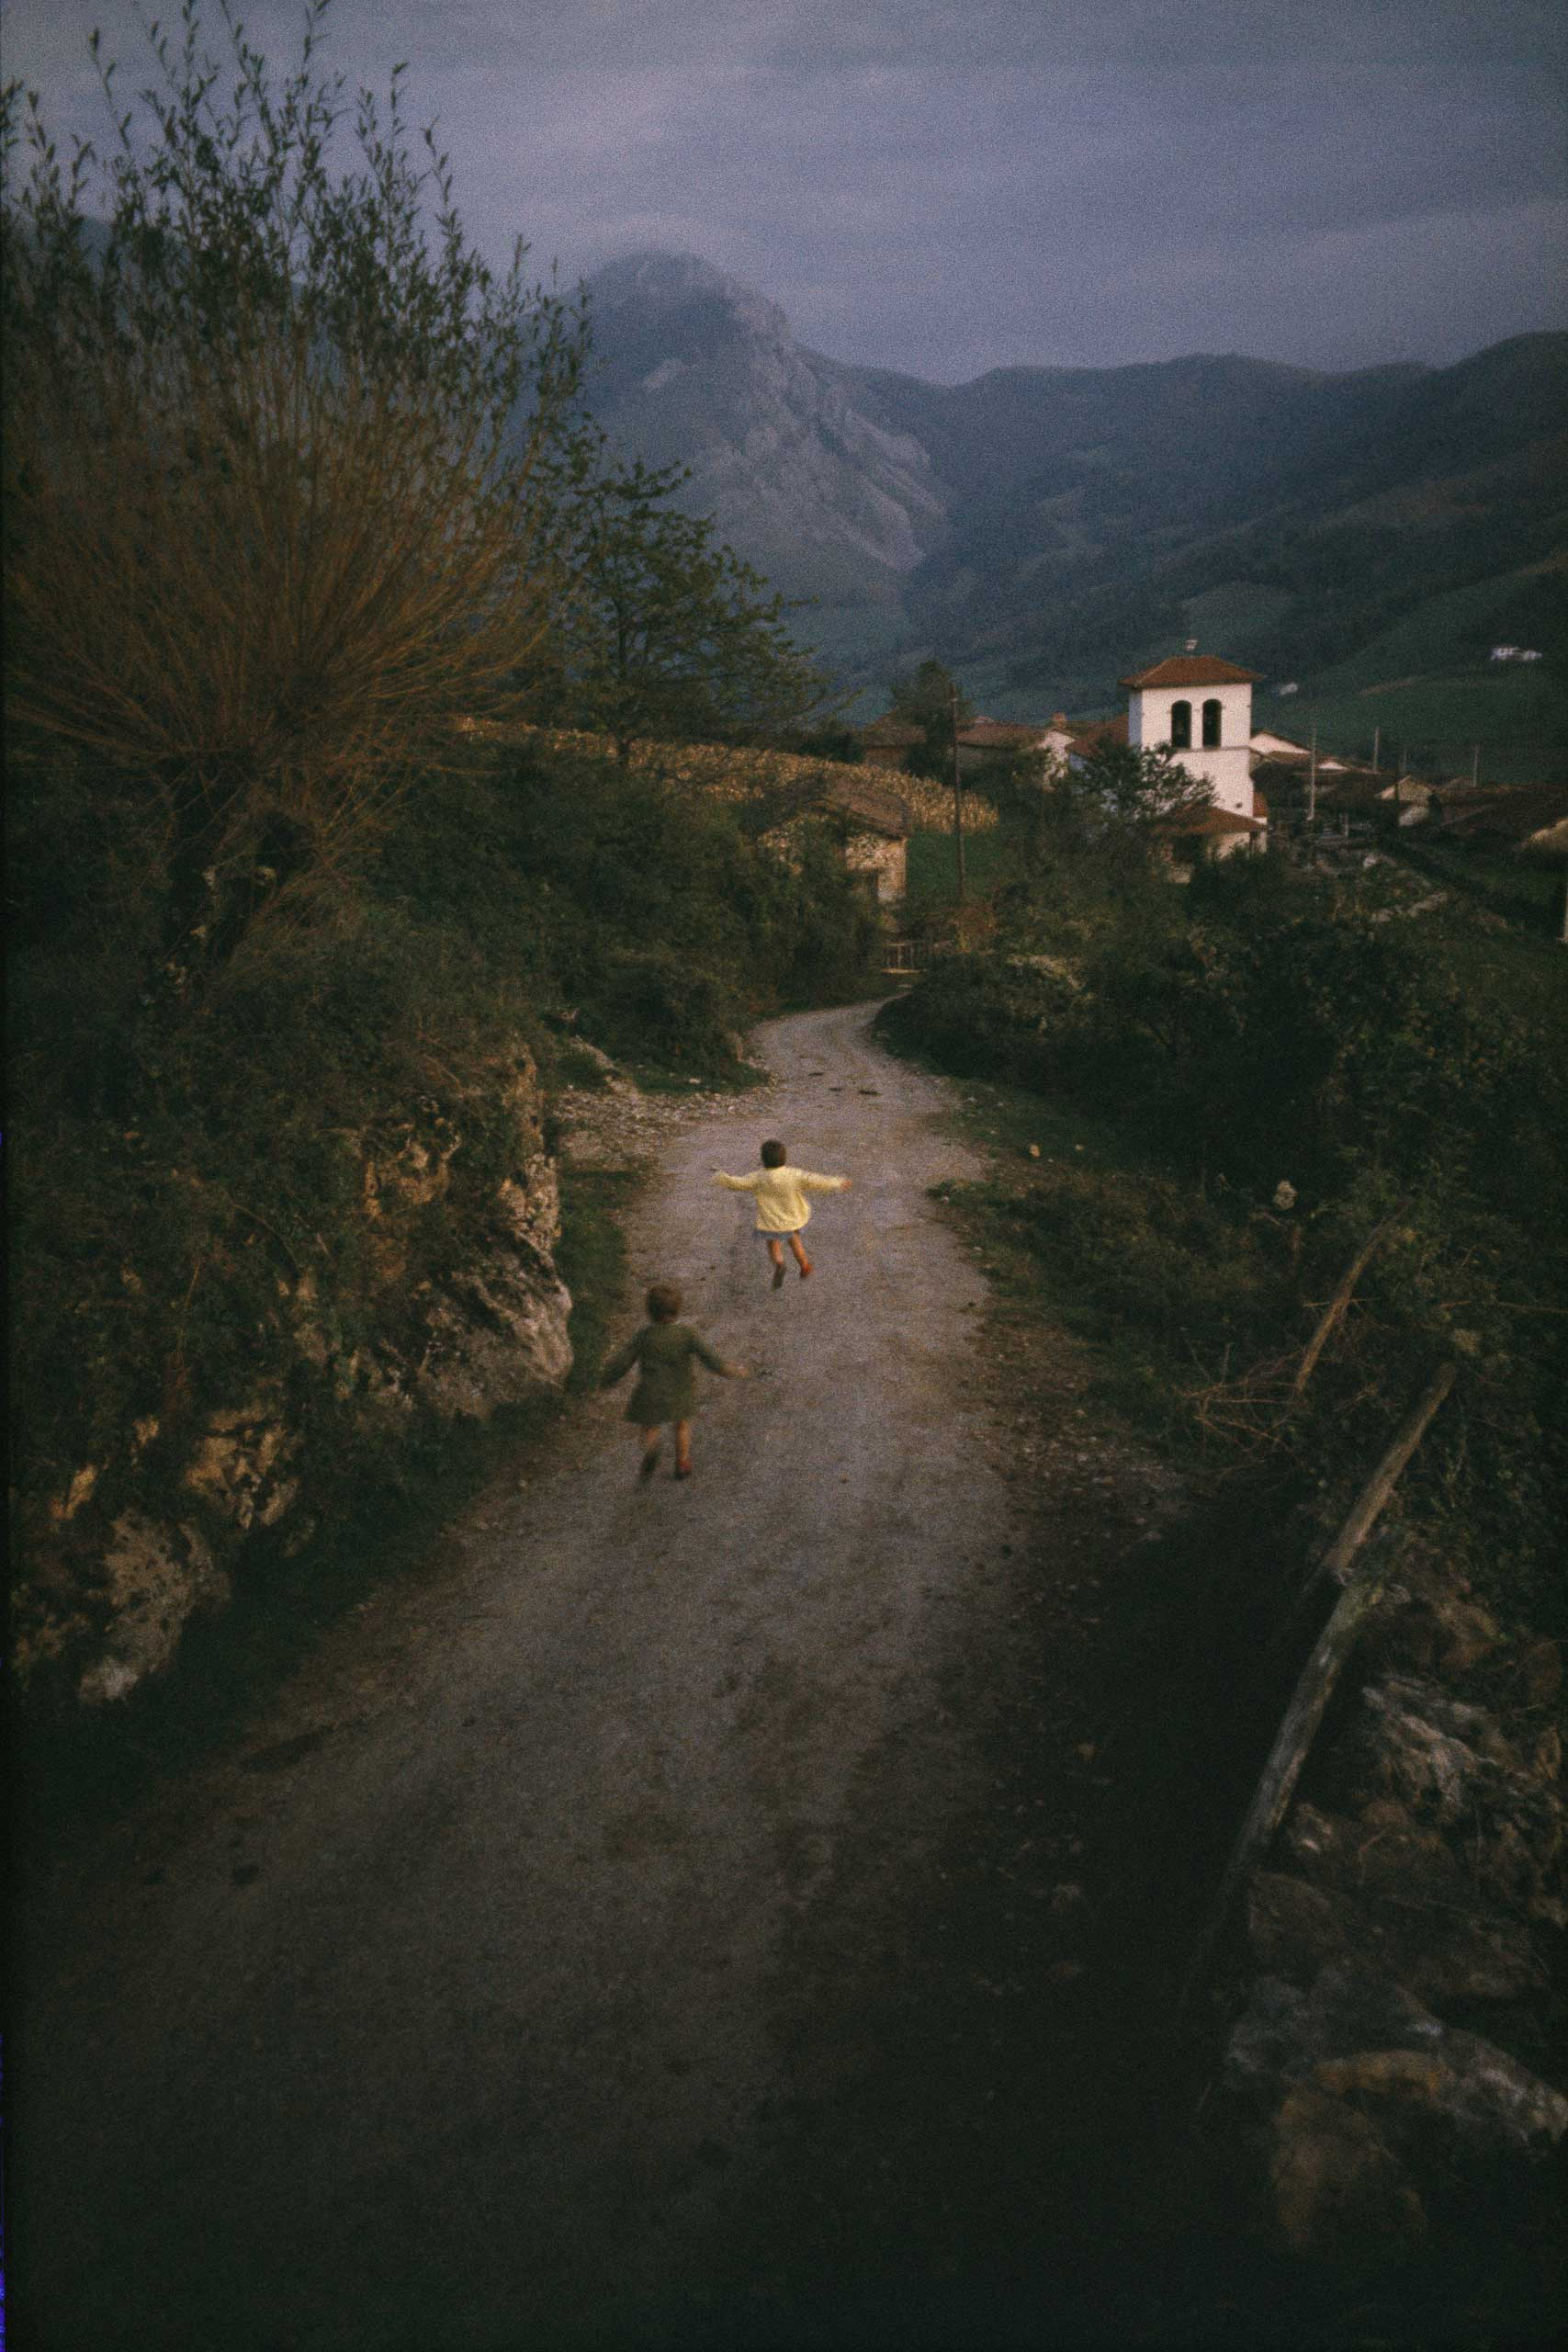 Béhorléguy, Basque Country, France, 1967.